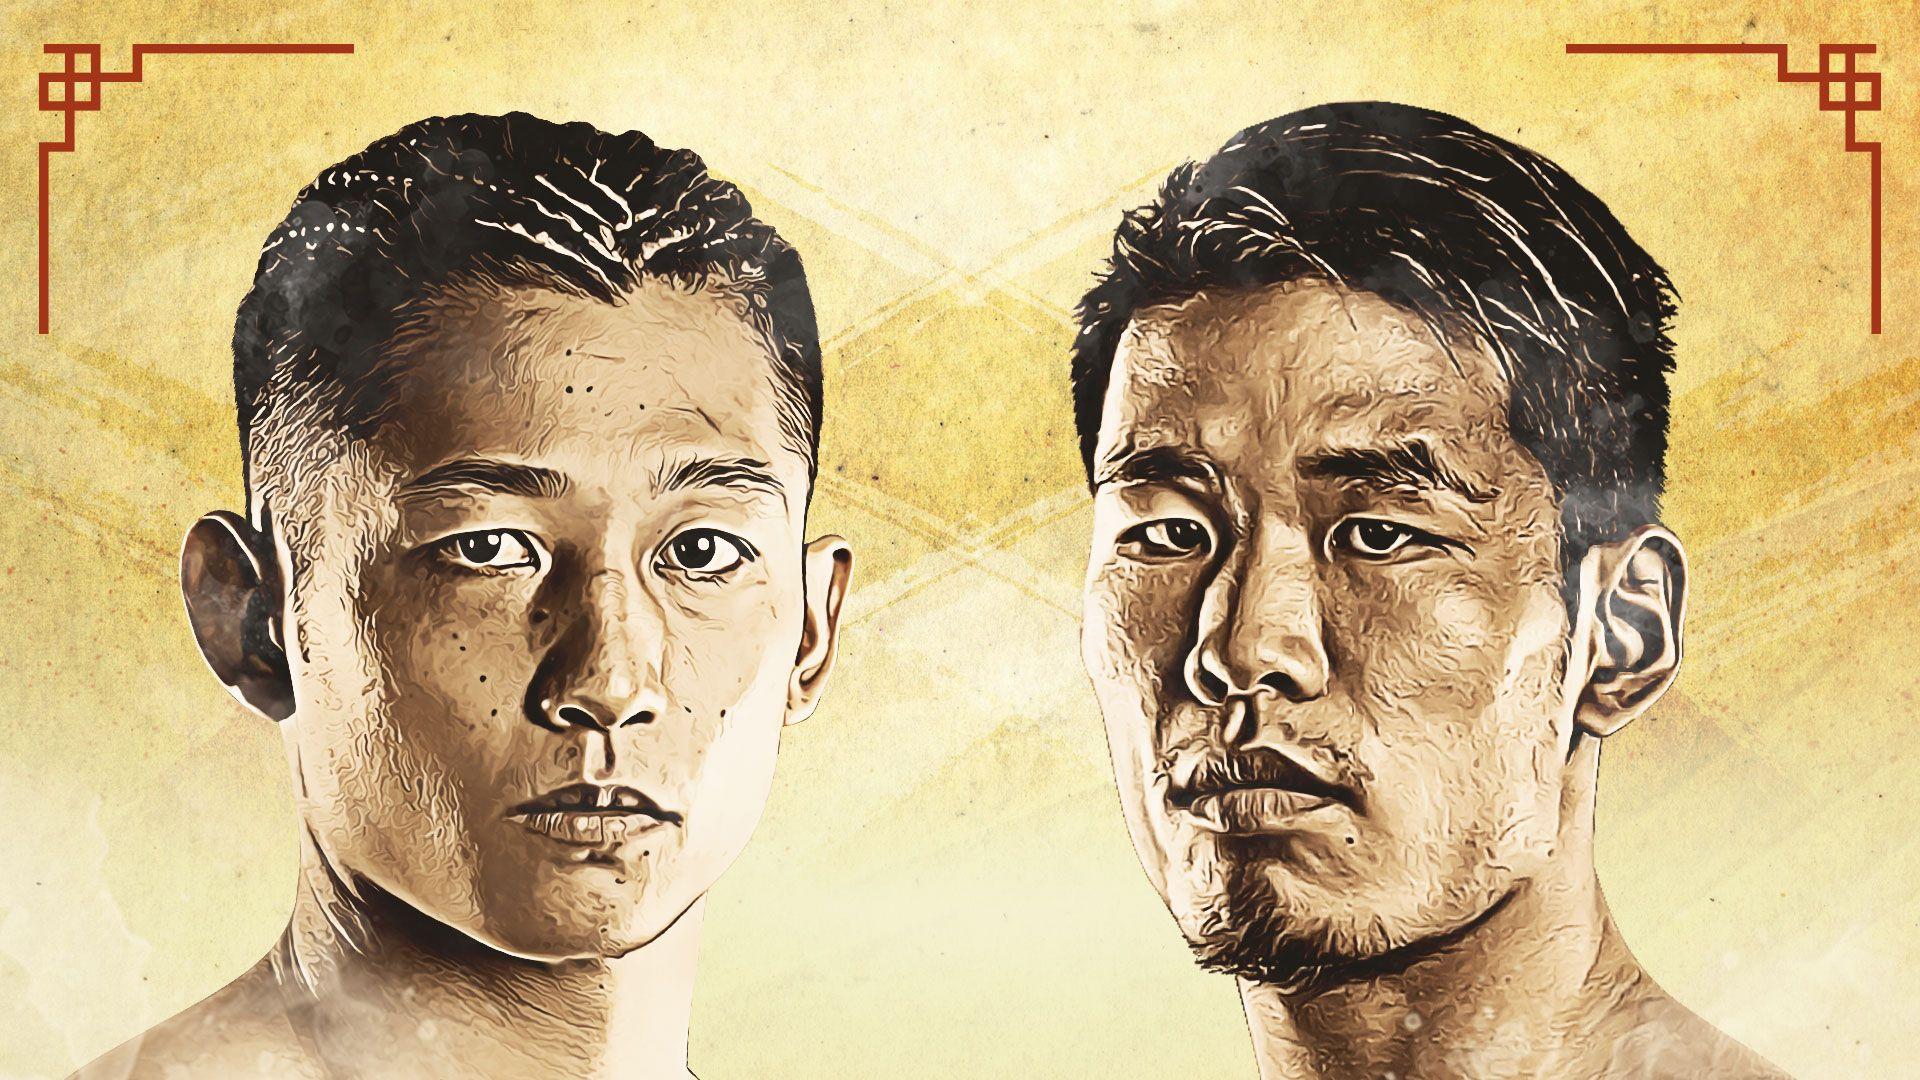 Hiroki Akimoto vs. Zhang Chenglong II goes down at ONE: FISTS OF FURY II on 26 February!